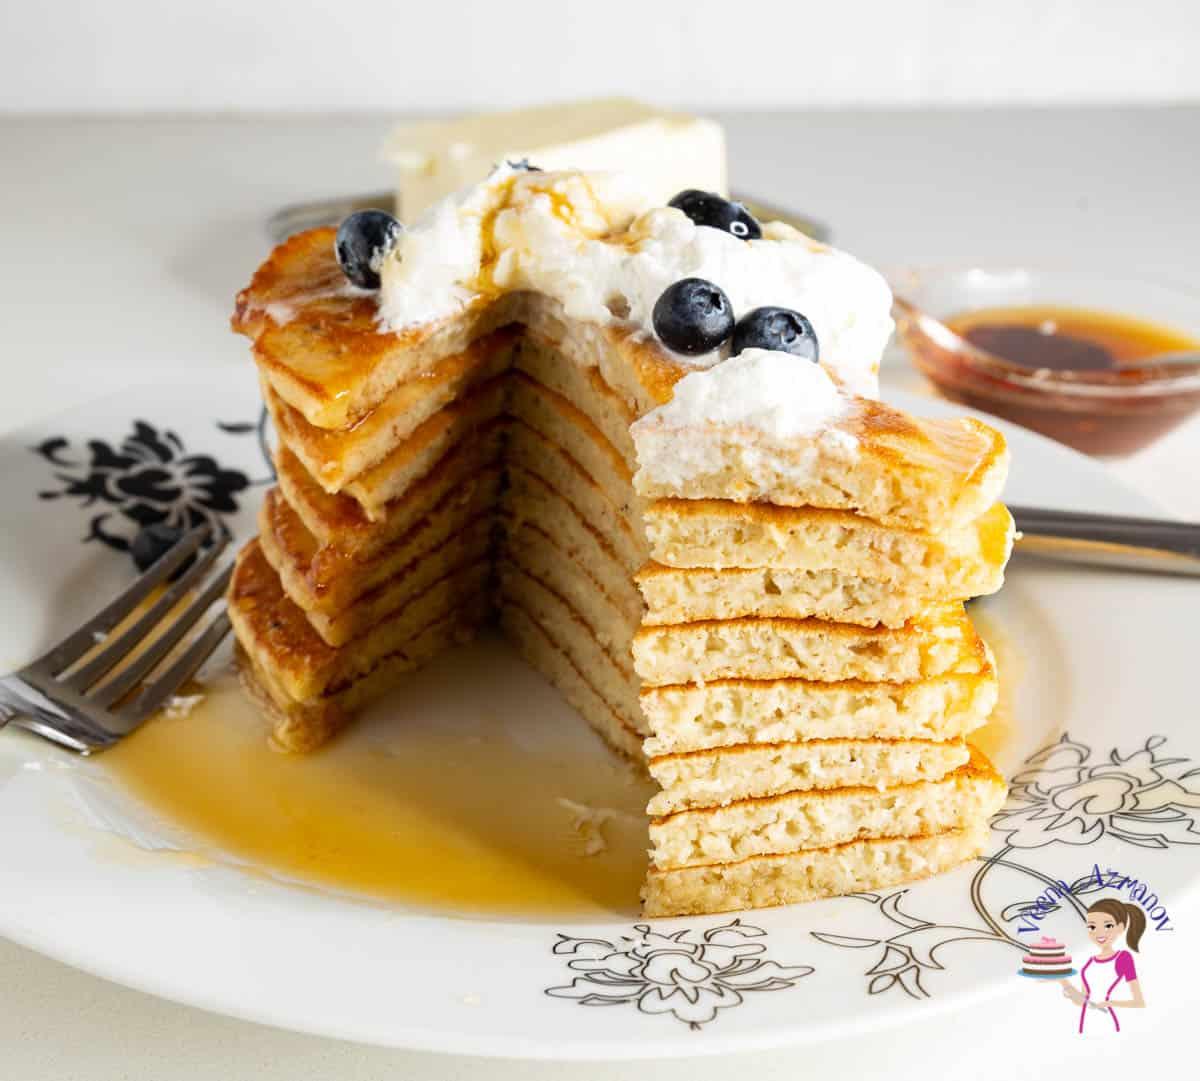 A cut stack of eggnog pancakes